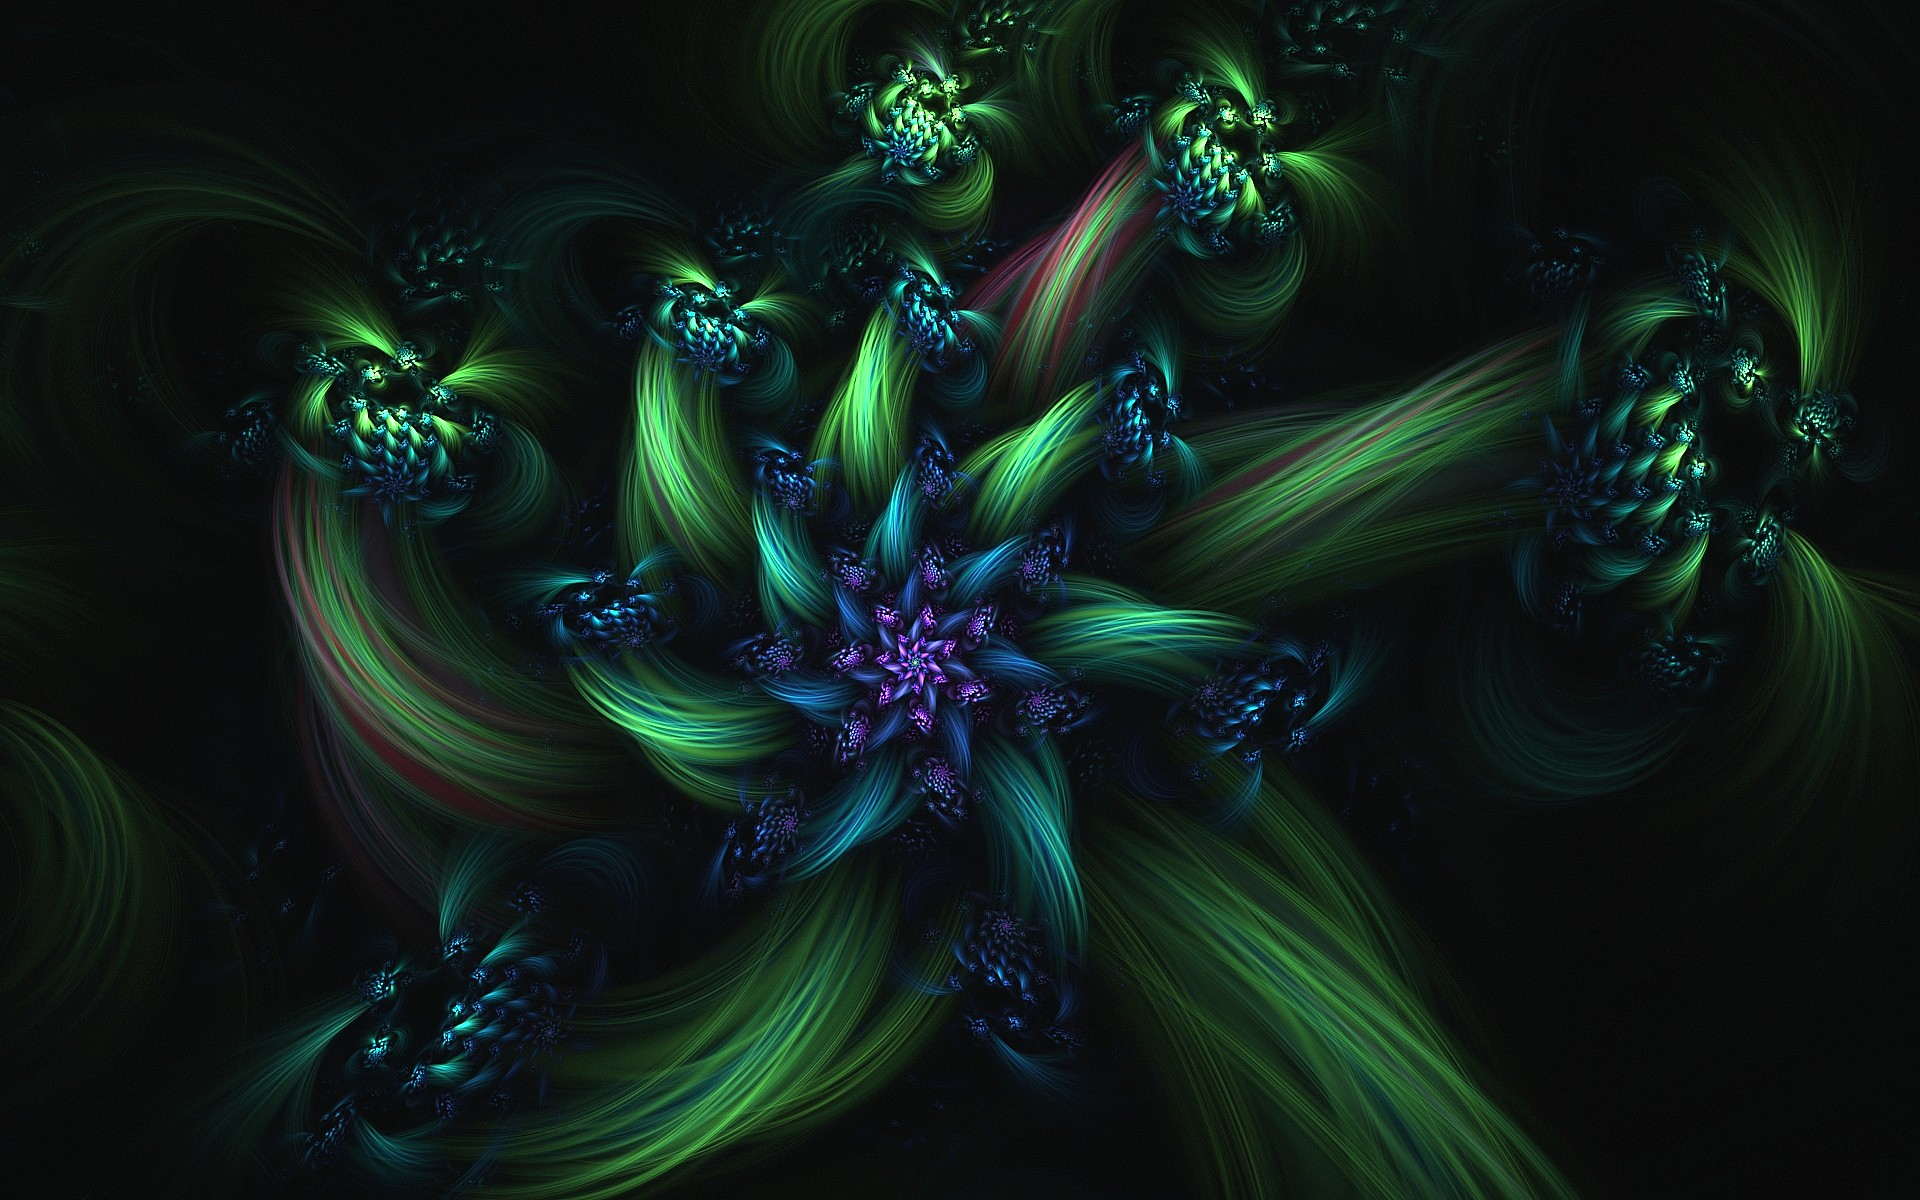 Emerald-Flower by eReSaW